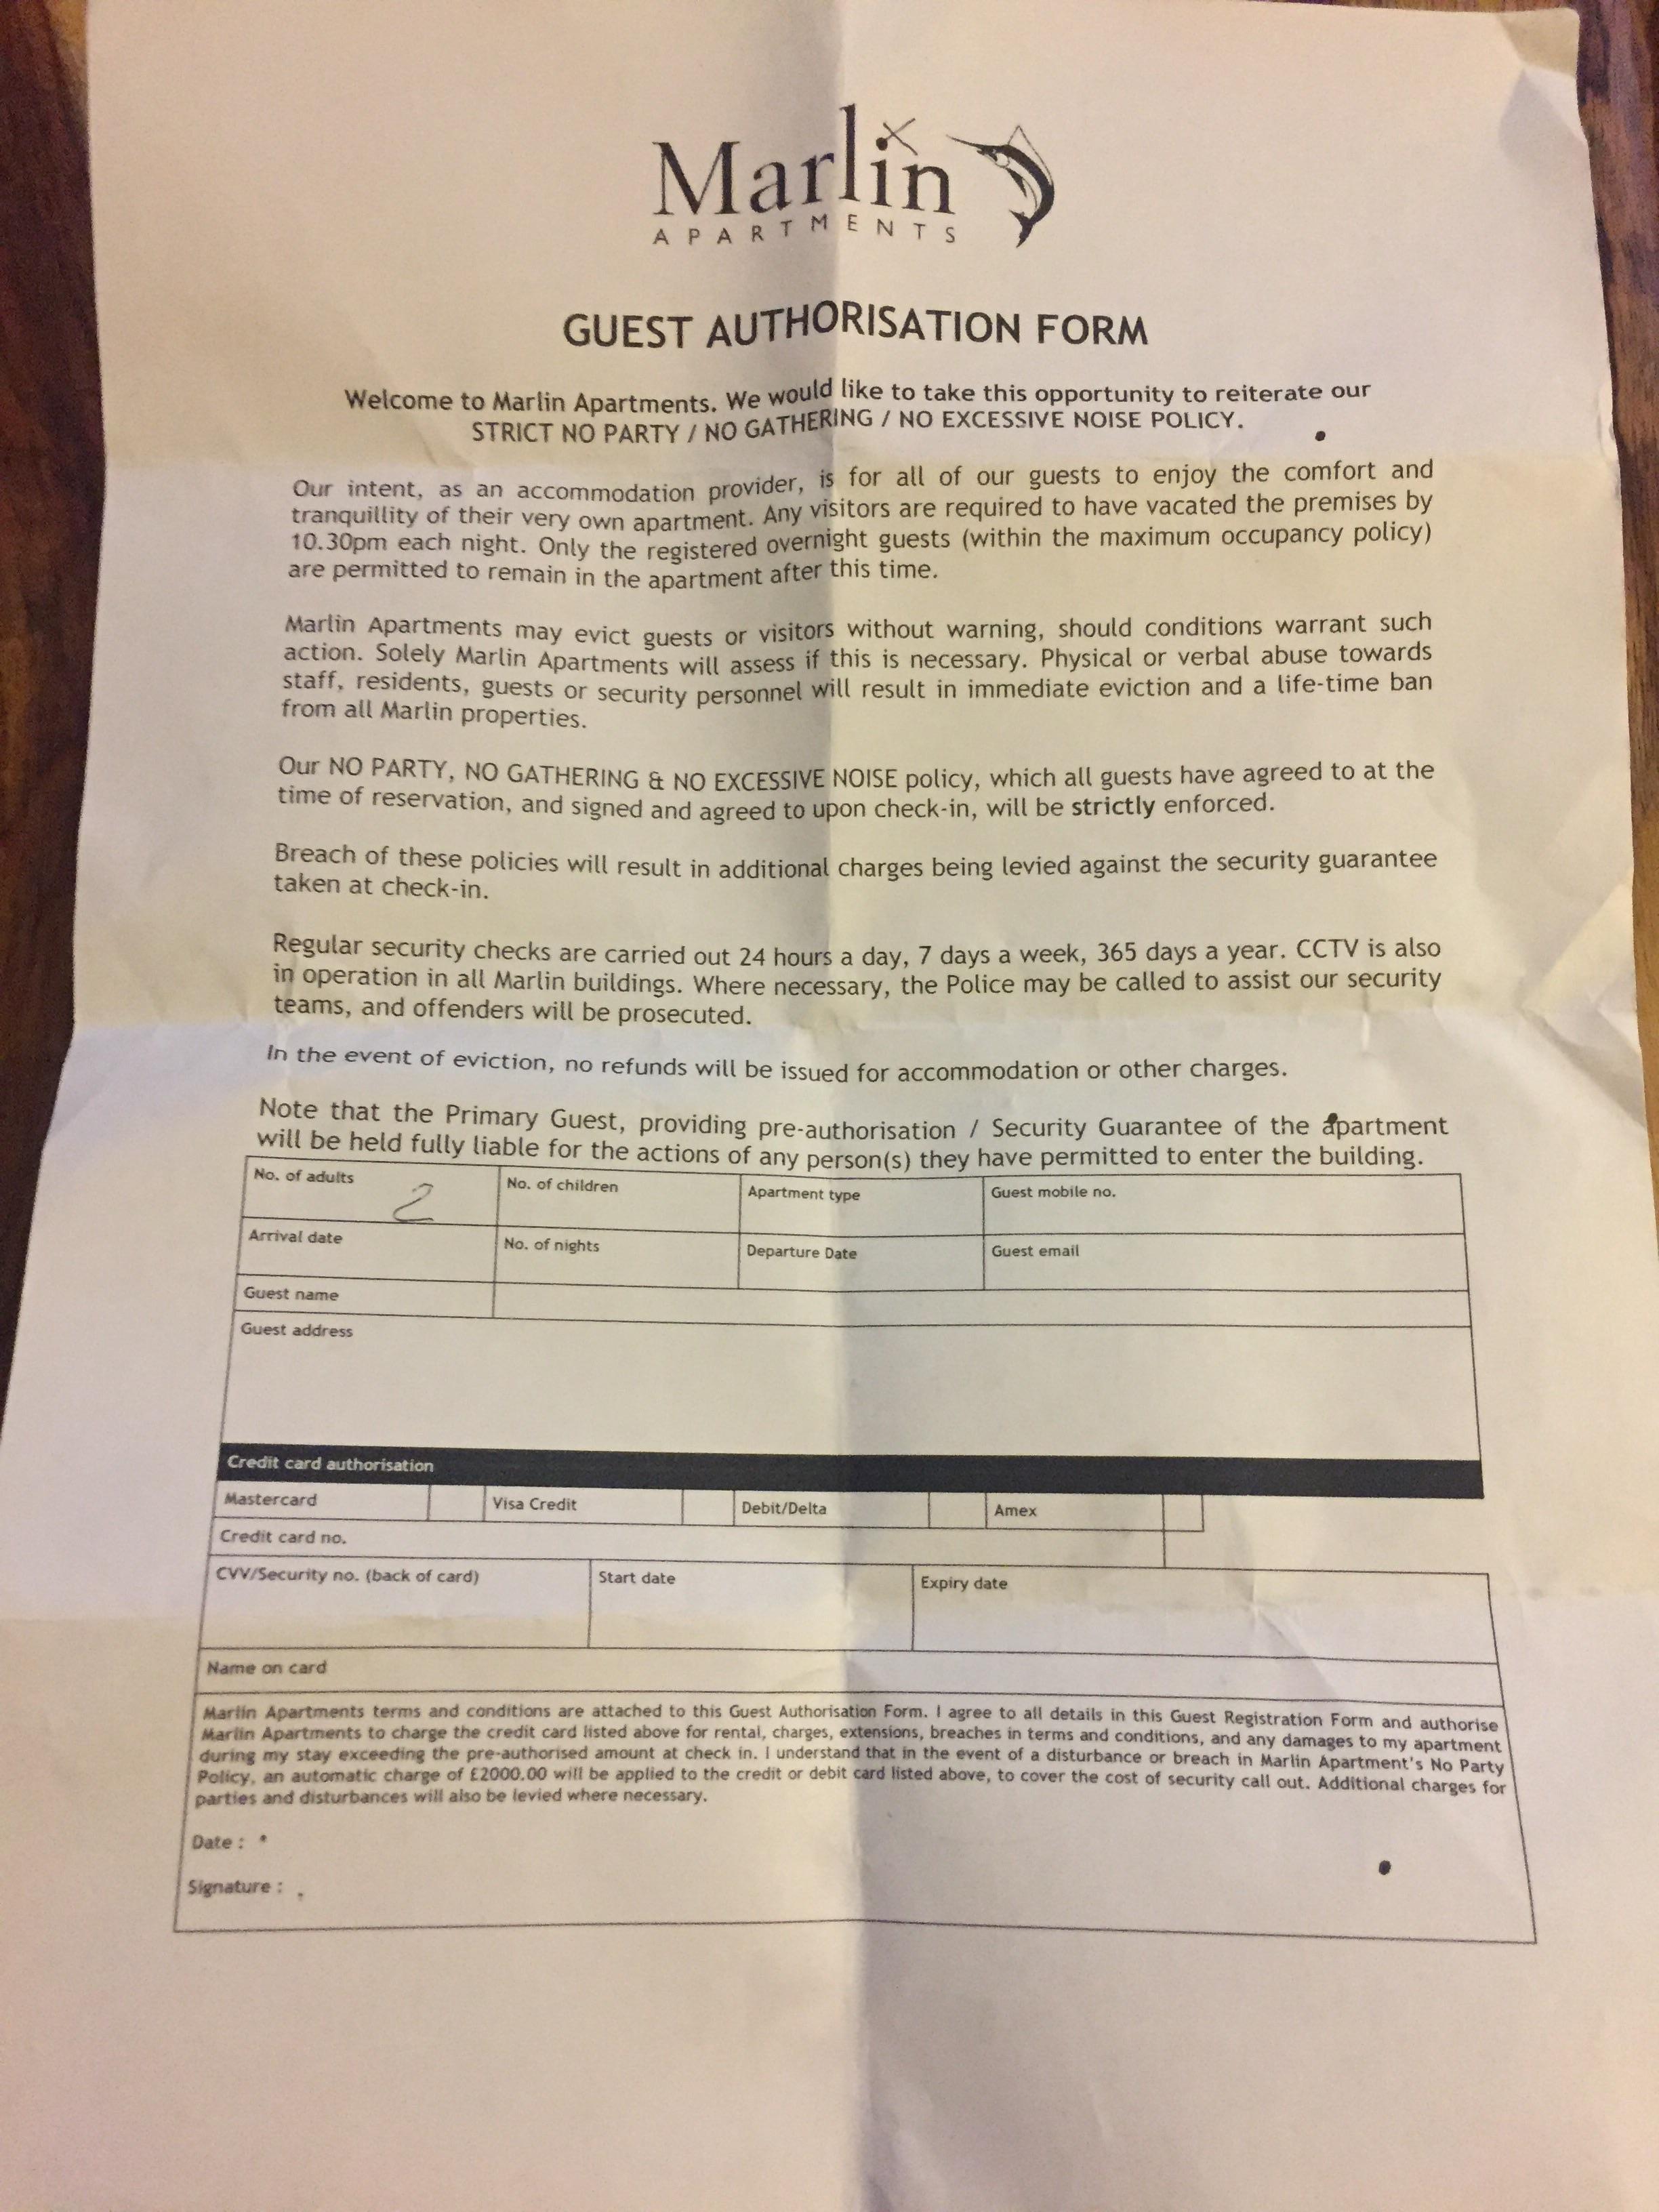 Card authorisation form for £2000 deposit